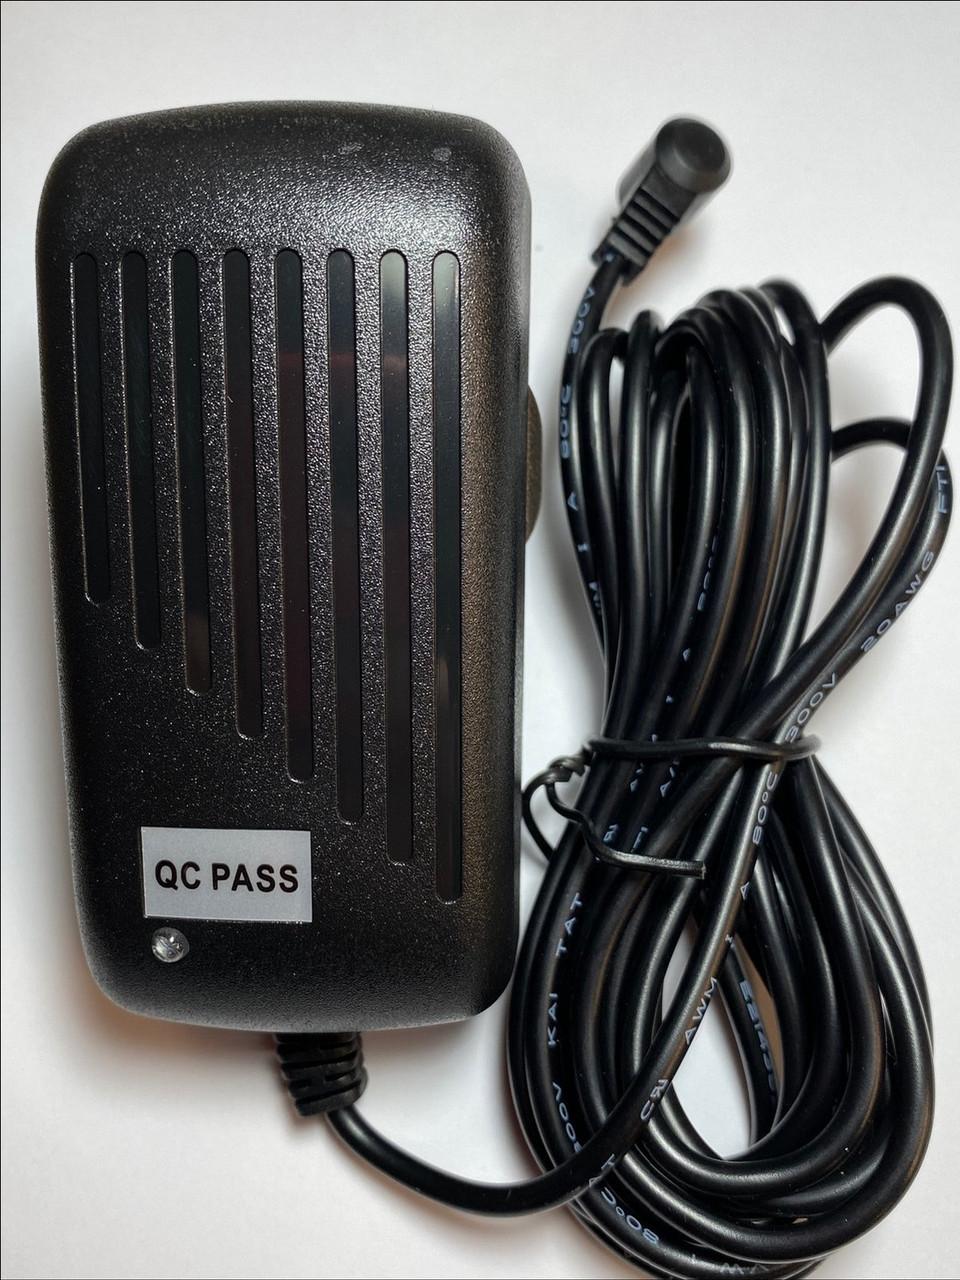 12V YAMAHA PSR-225 PSR-640 PSS-35 KEYBOARD AC ADAPTOR POWER SUPPLY CHARGER PLUG